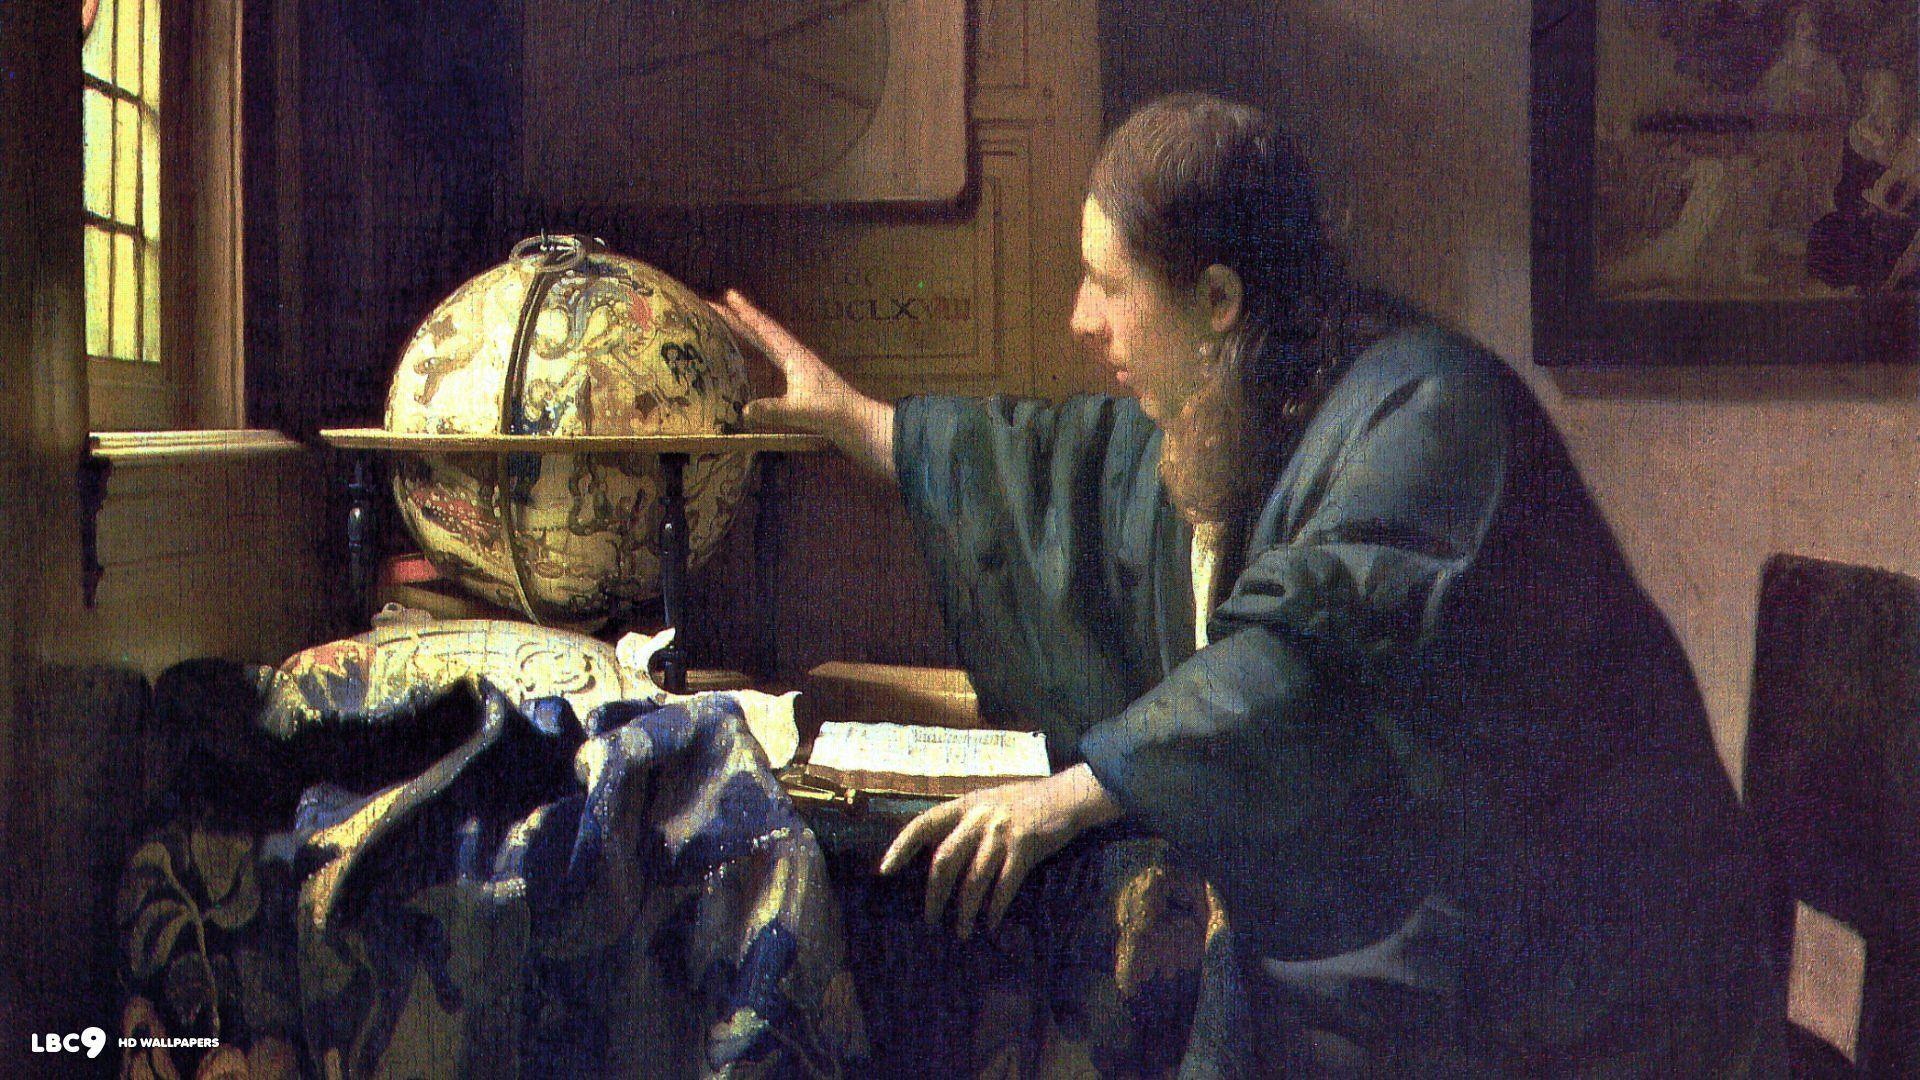 Wallpaper Jan Vermeer Astronomer - 1920 x 1080 - Famous Painting .